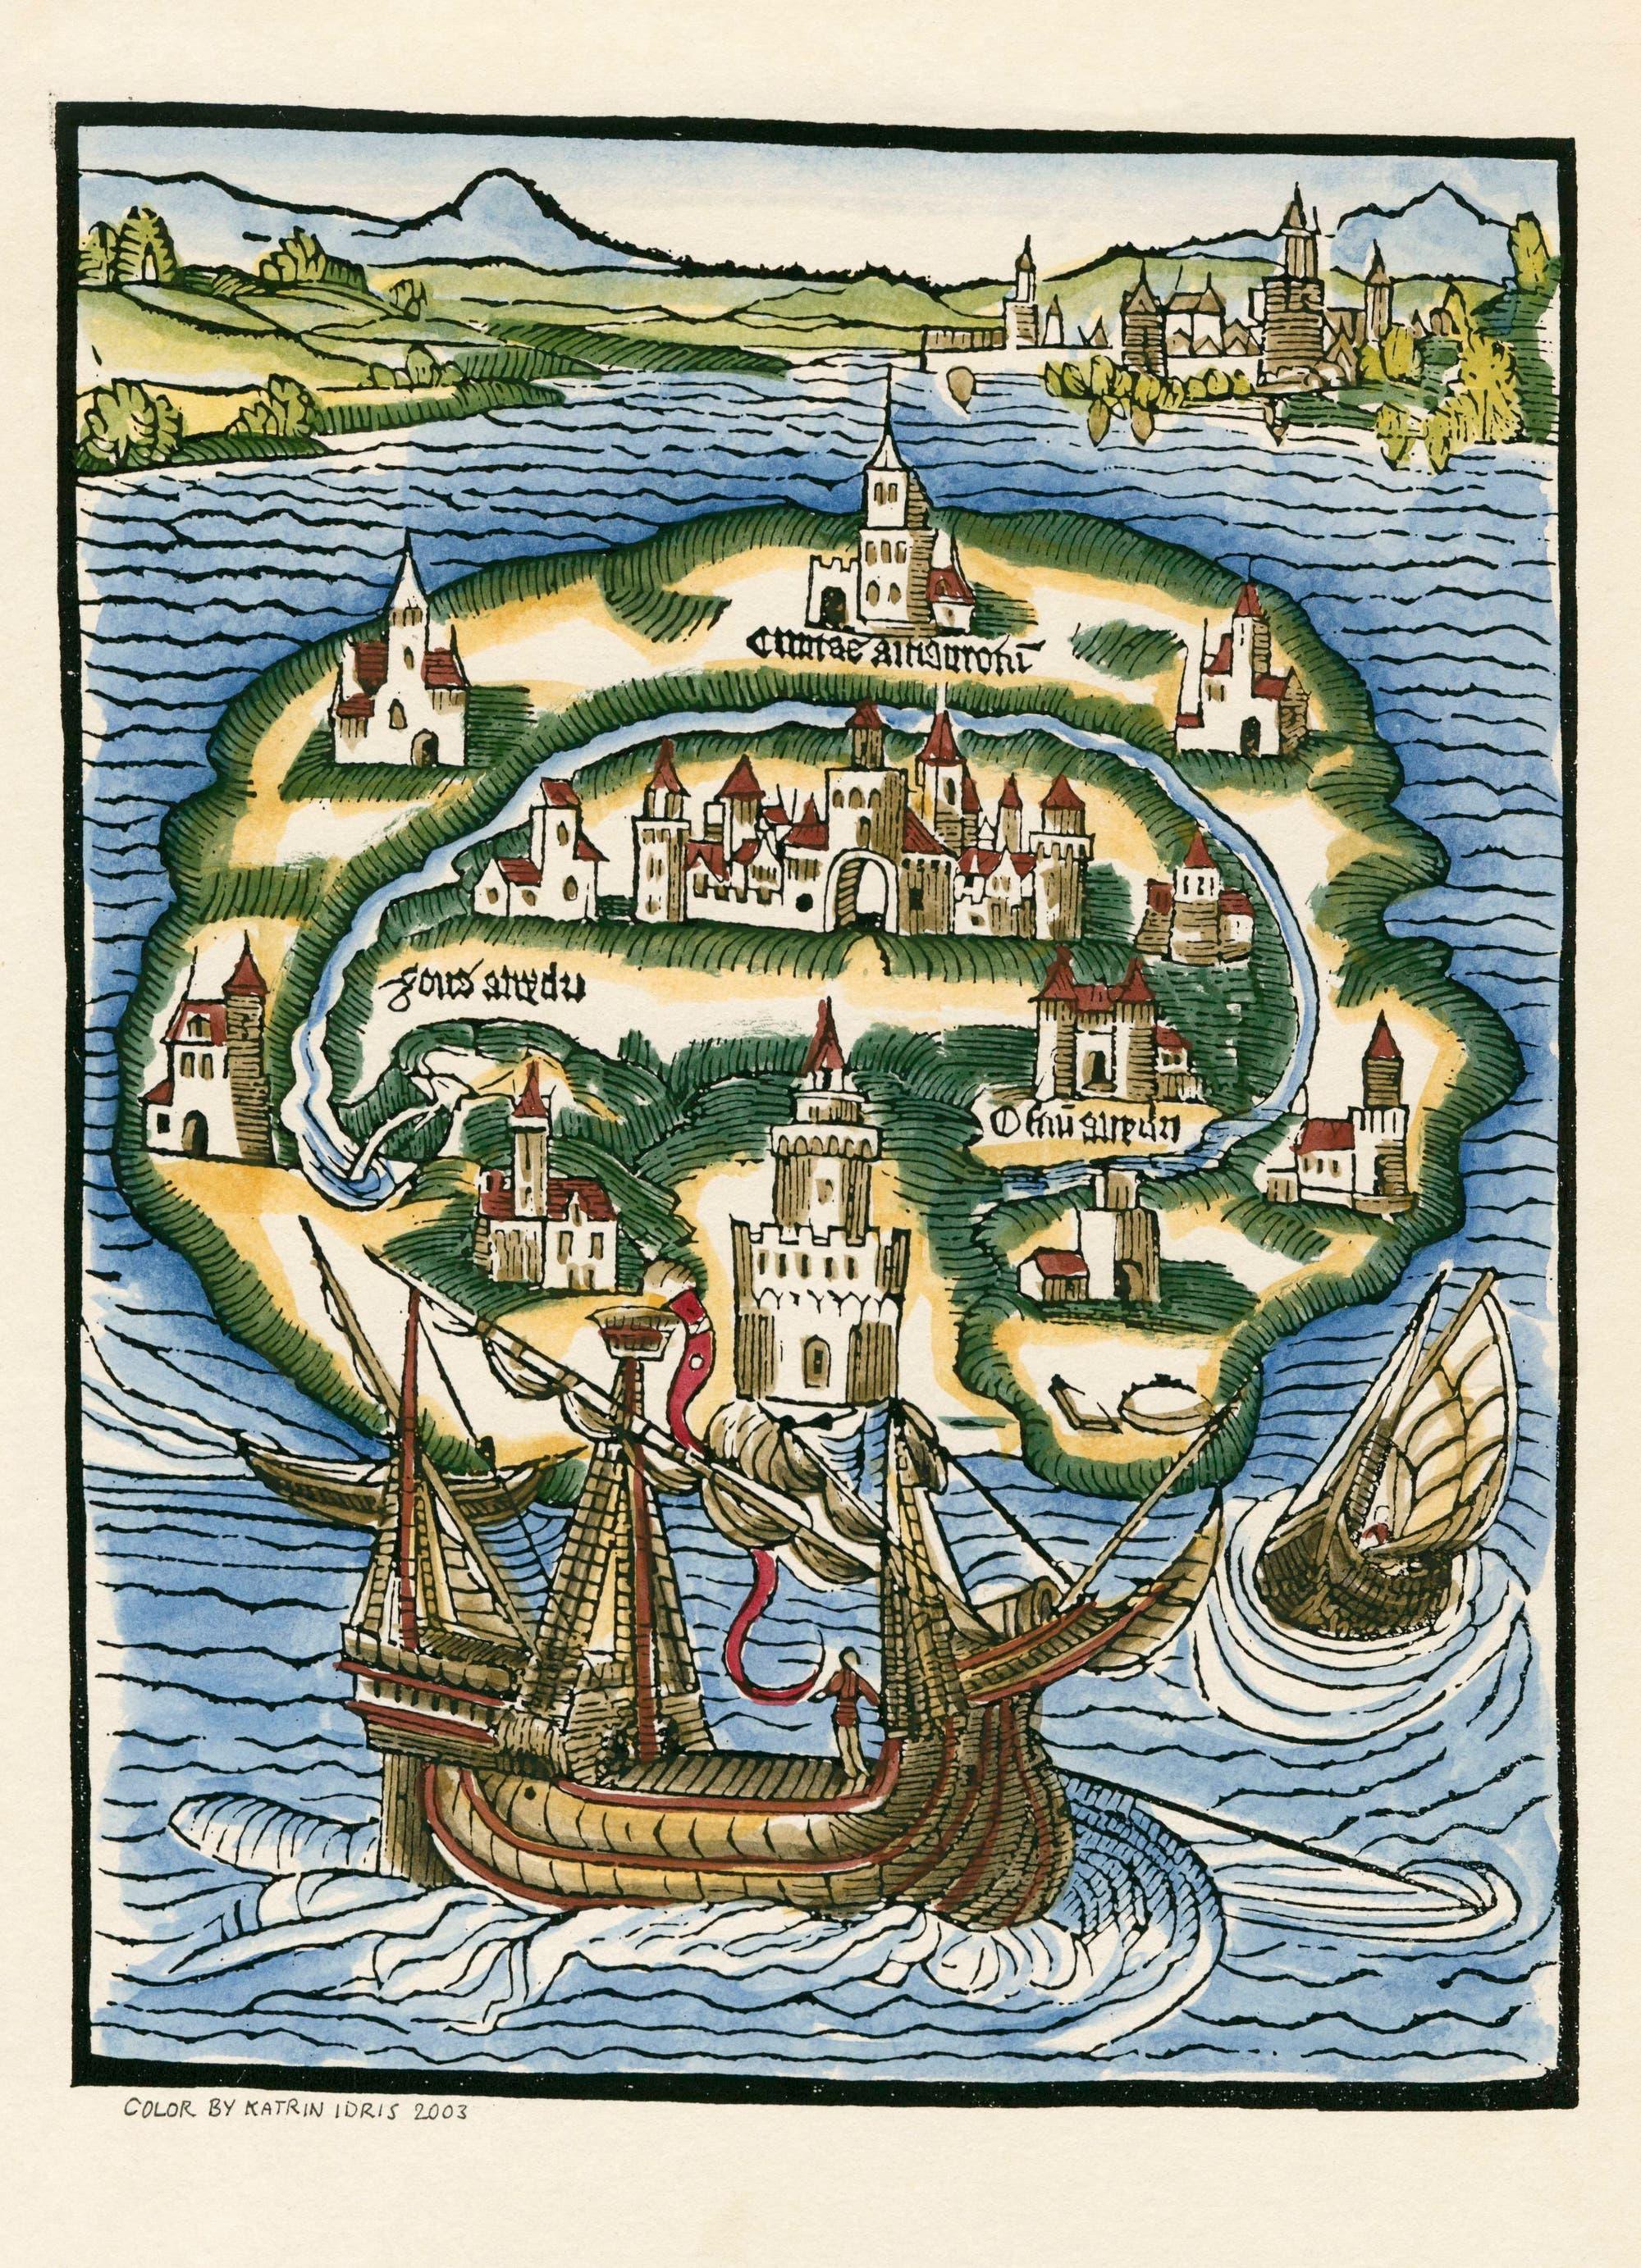 Karte der Insel Utopia